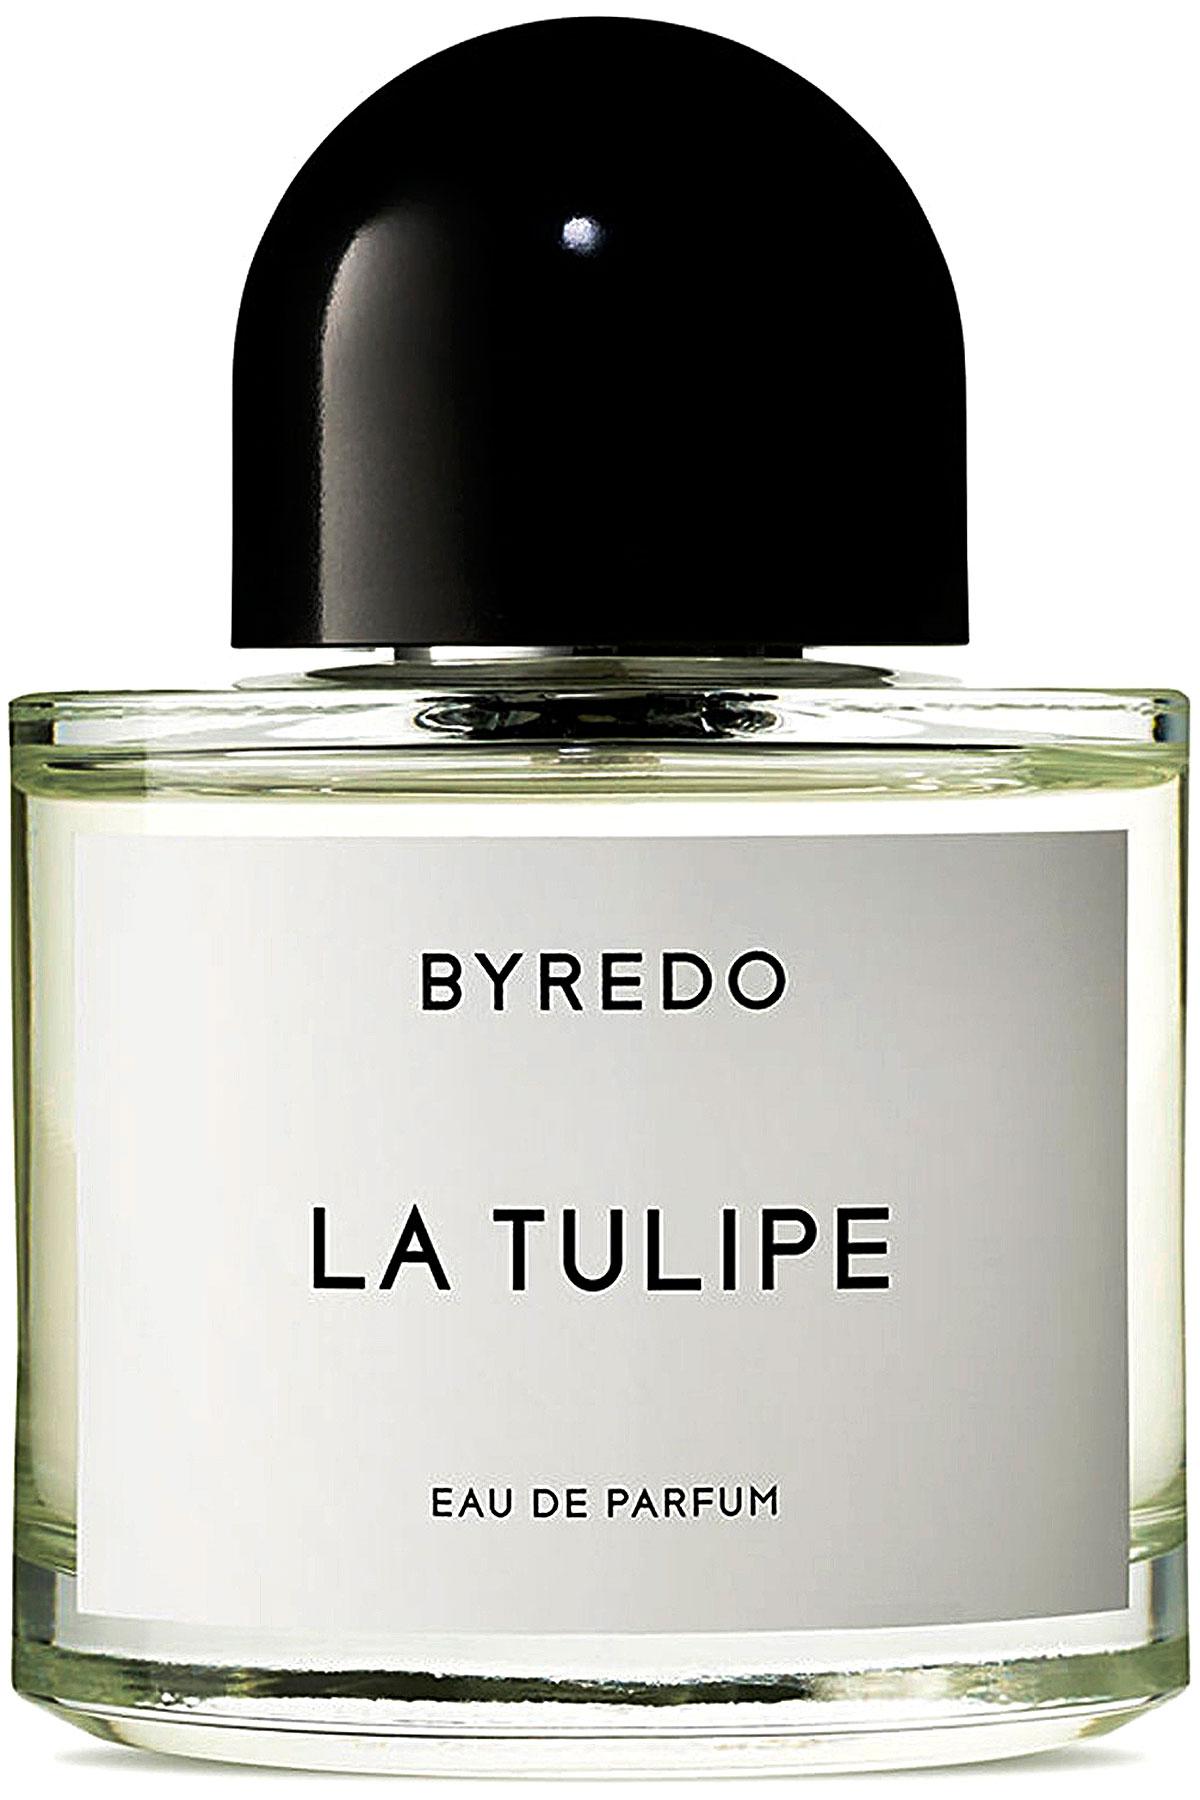 Byredo Fragrances for Women On Sale, La Tulipe - Eau De Parfum - 50 Ml, 2019, 50 ml